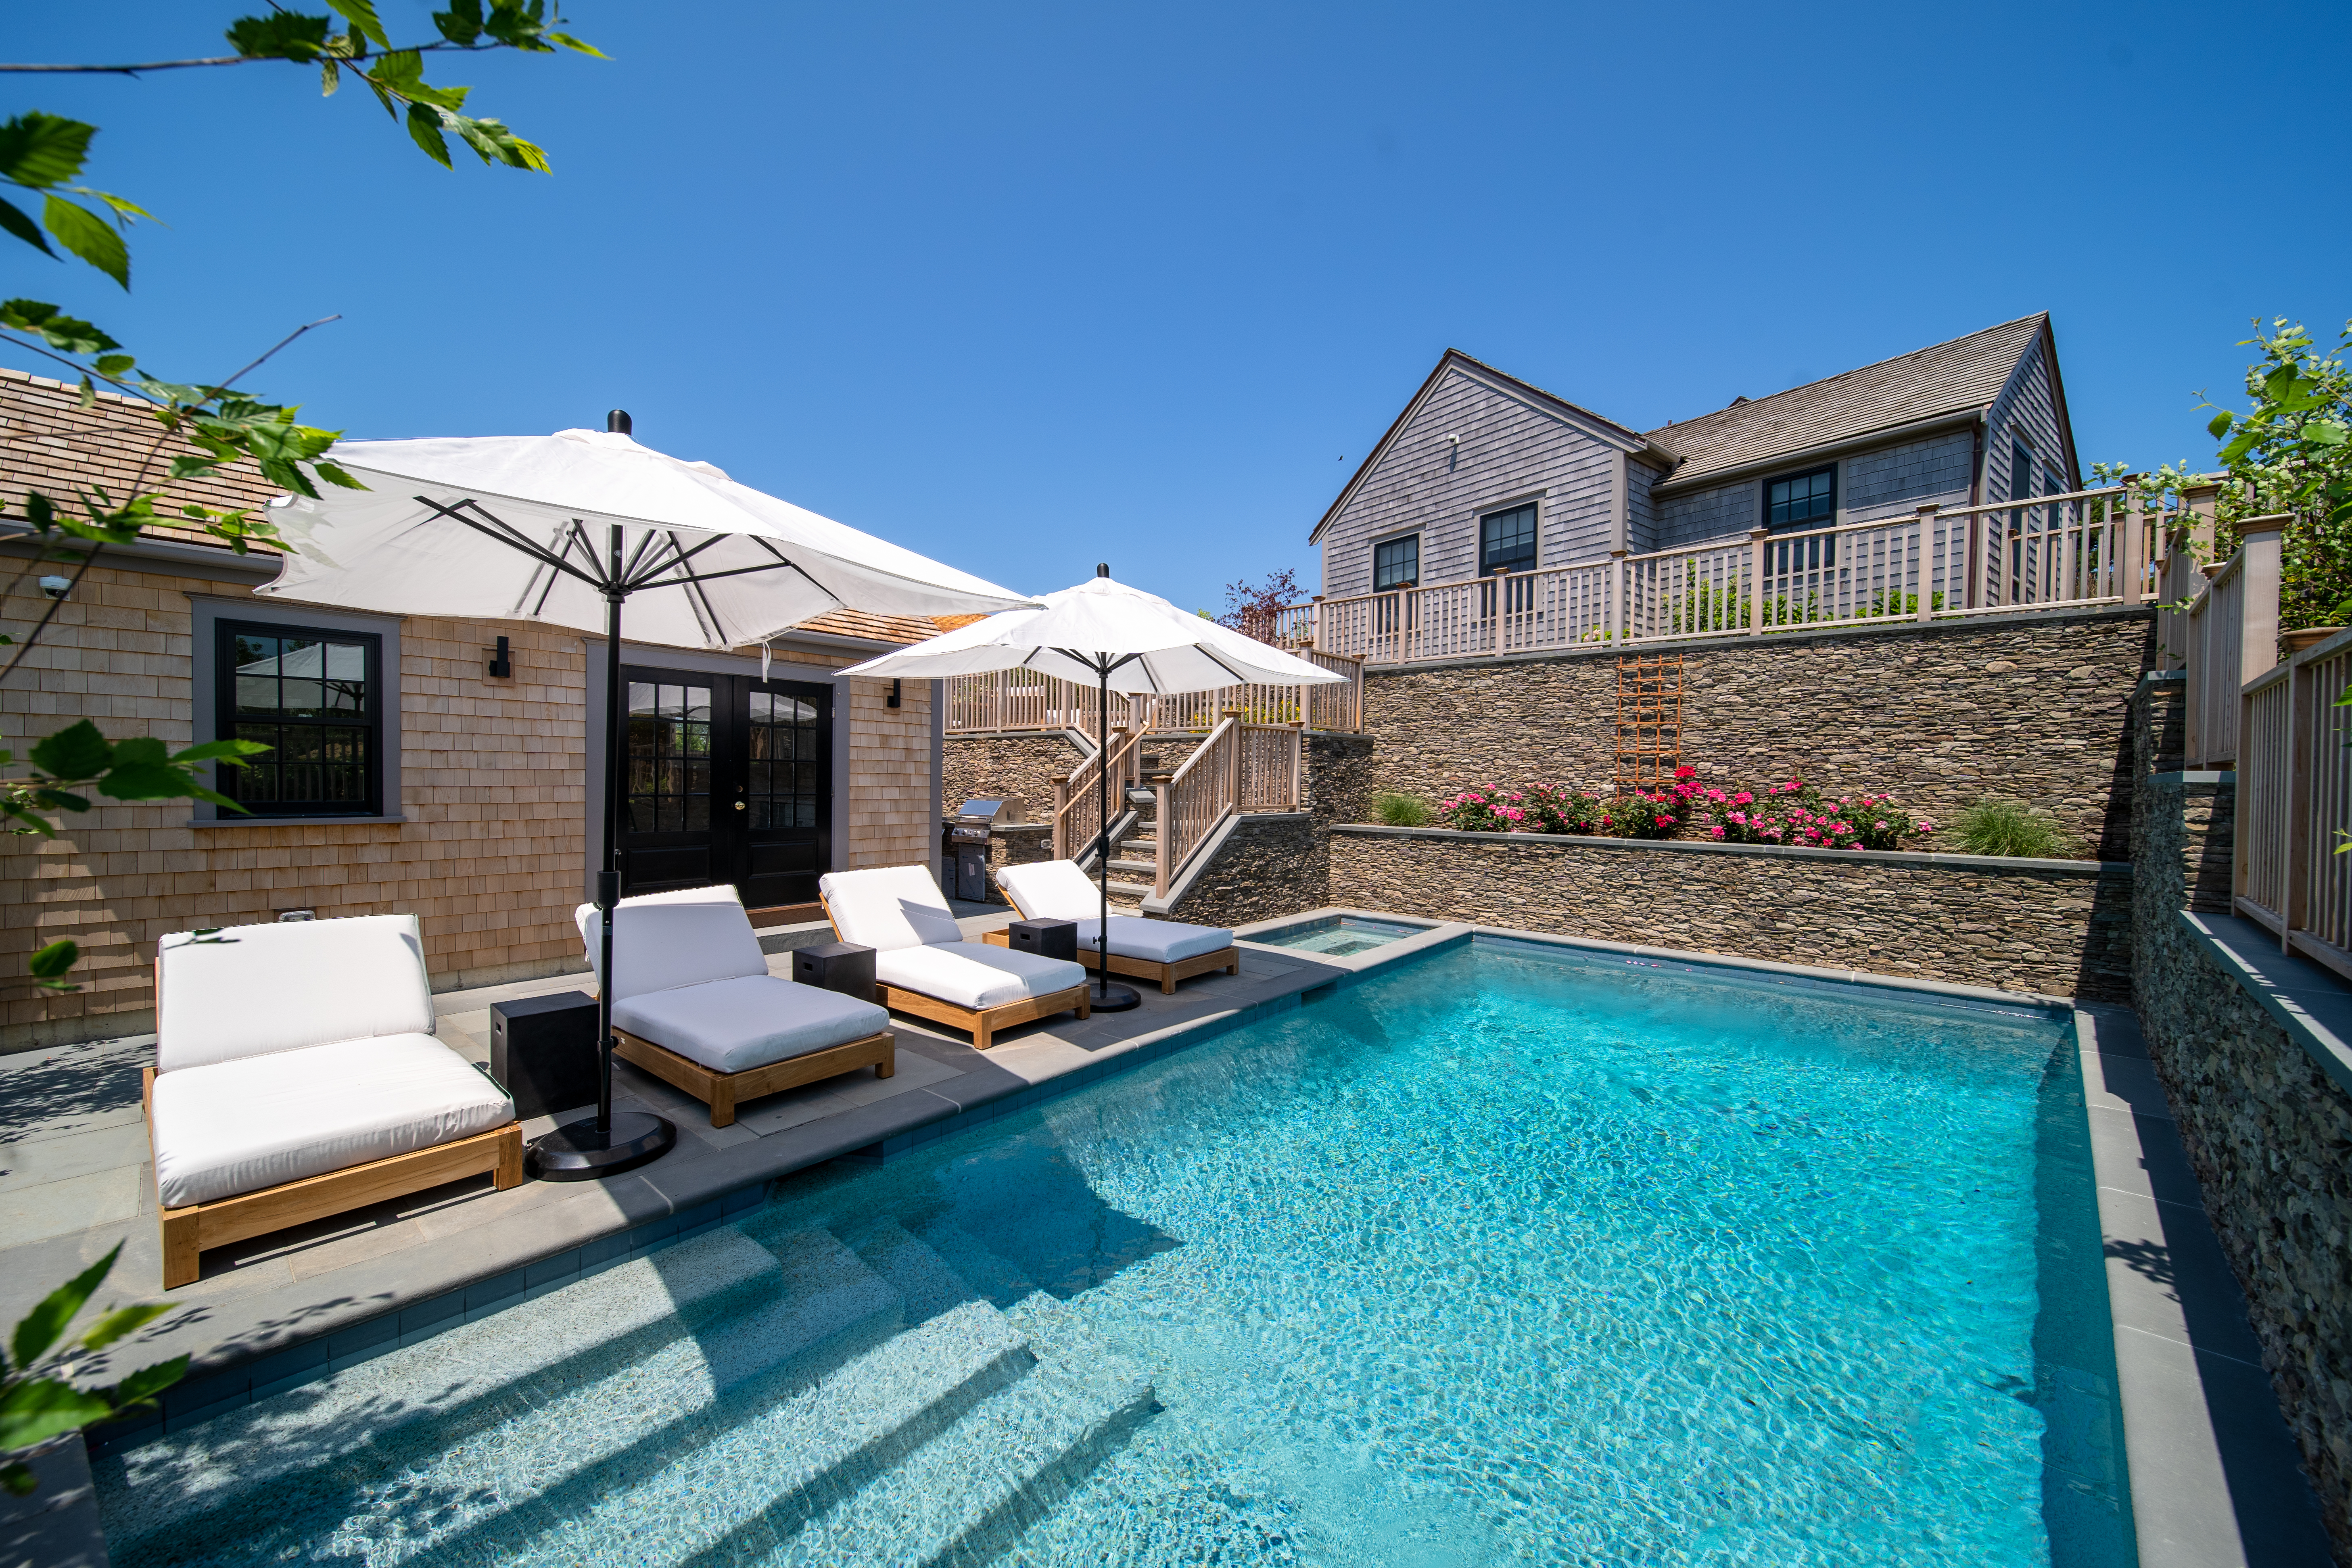 Nantucket Vacation Rentals |Jordan Real Estate